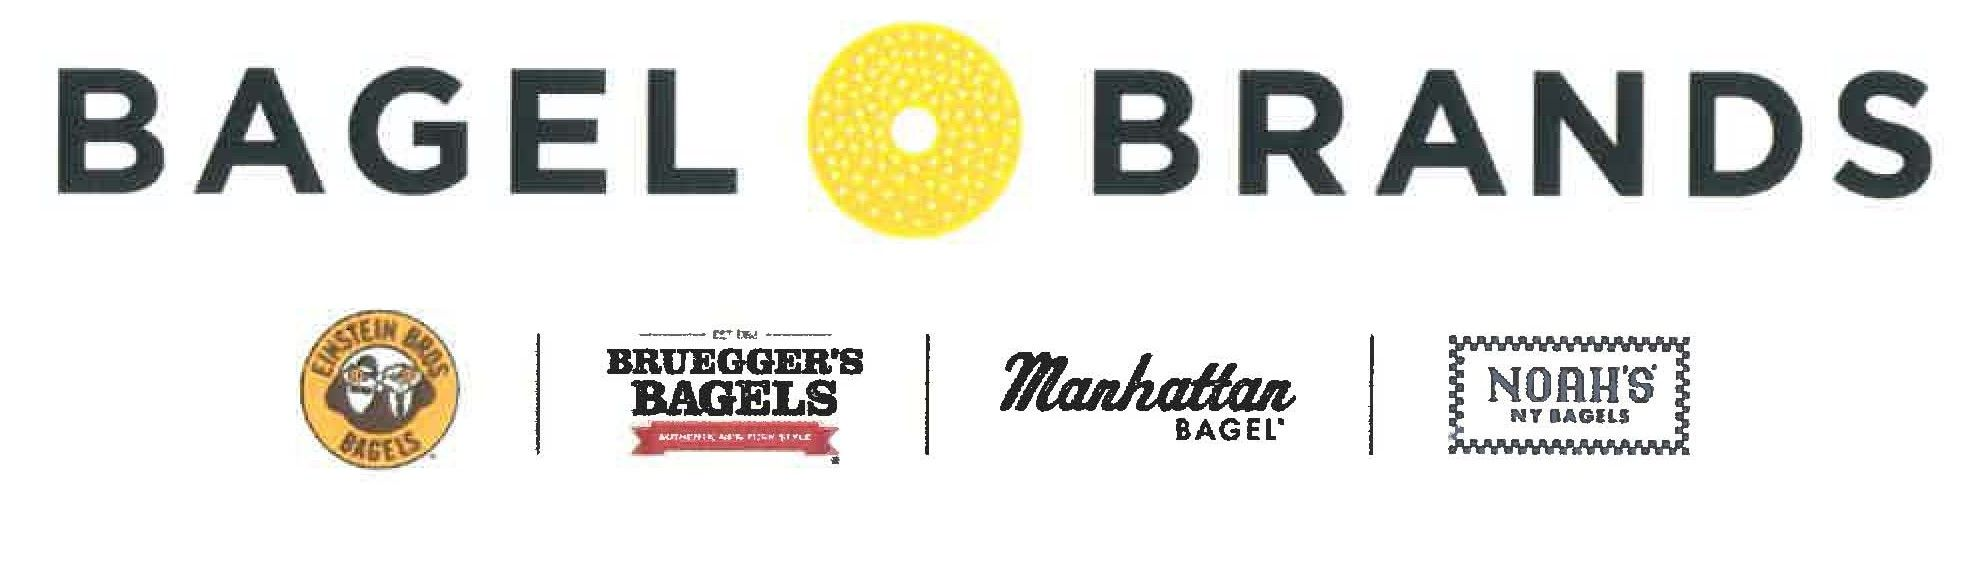 Coffee & Bagel Brands